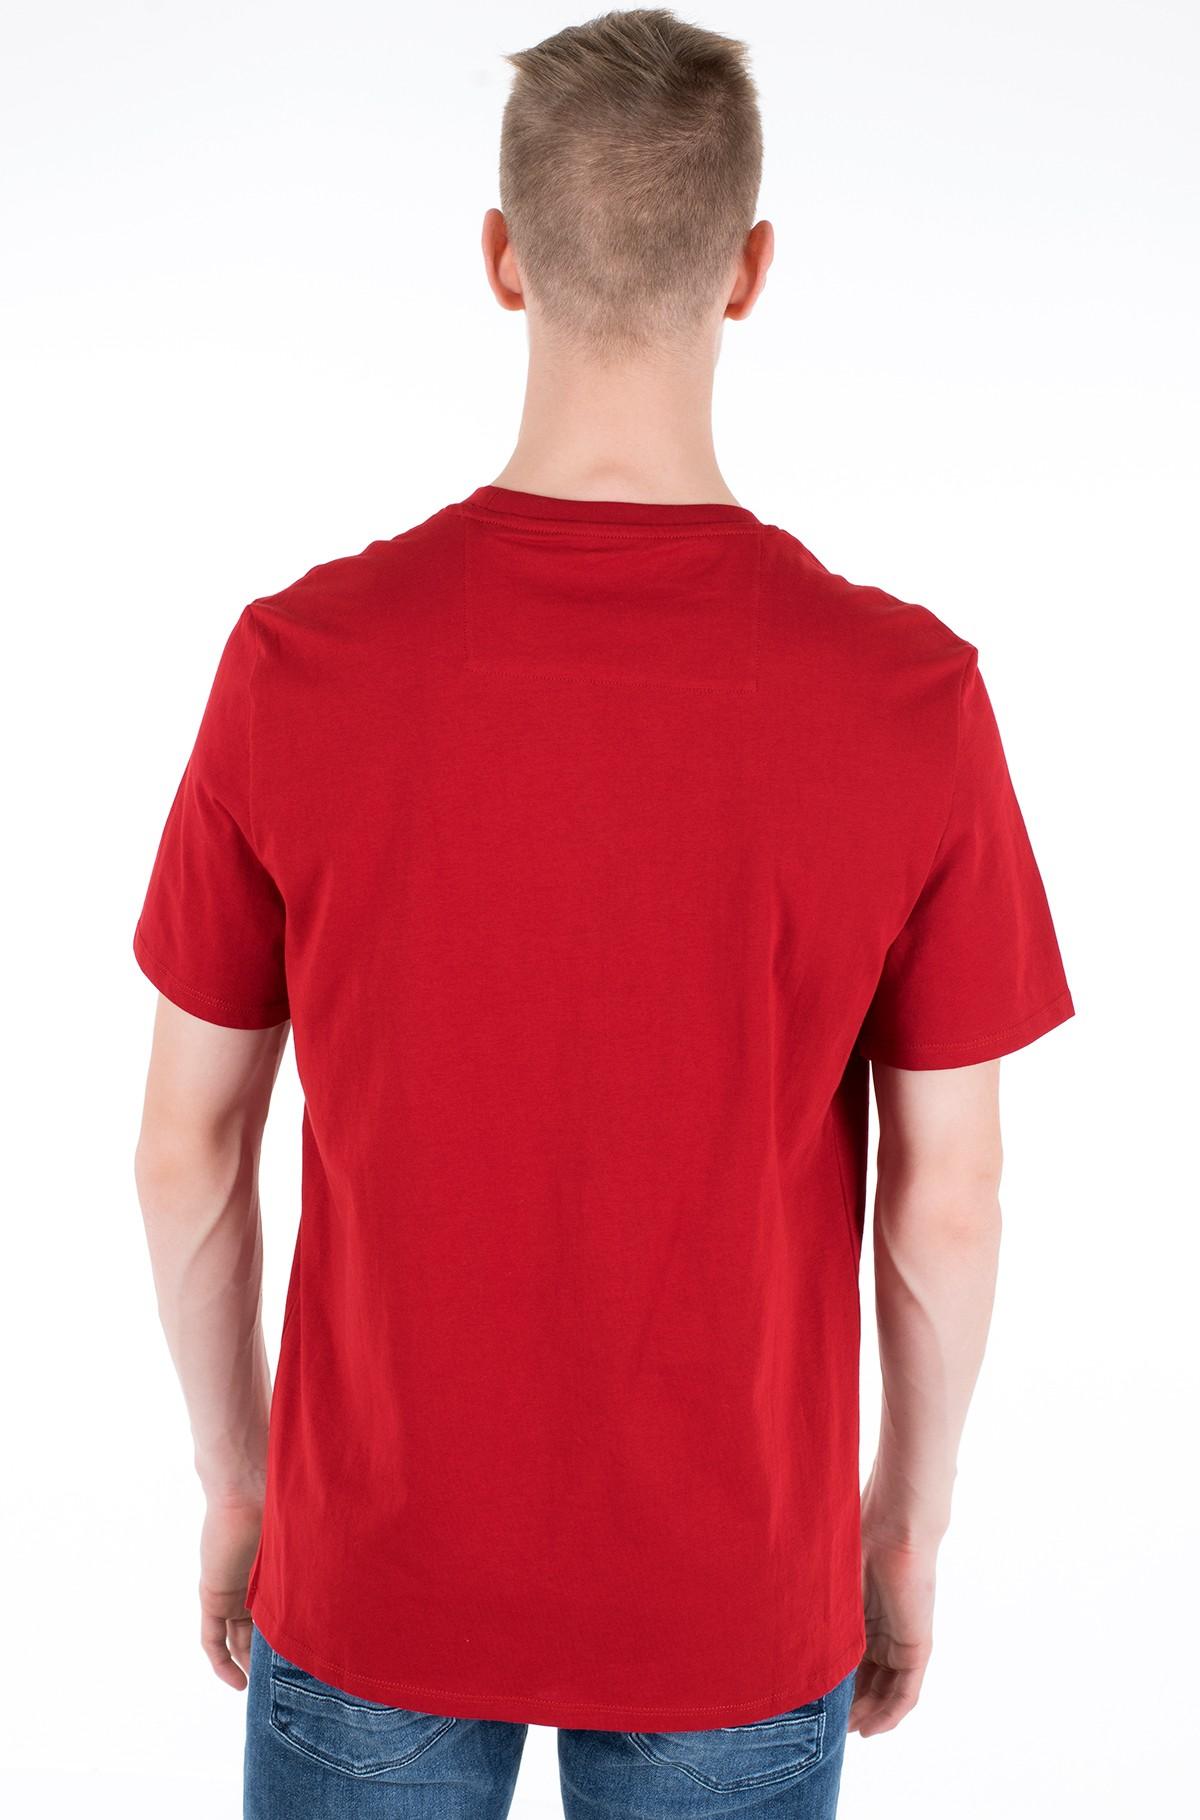 T-shirt M0BI66 K8HM0-full-2